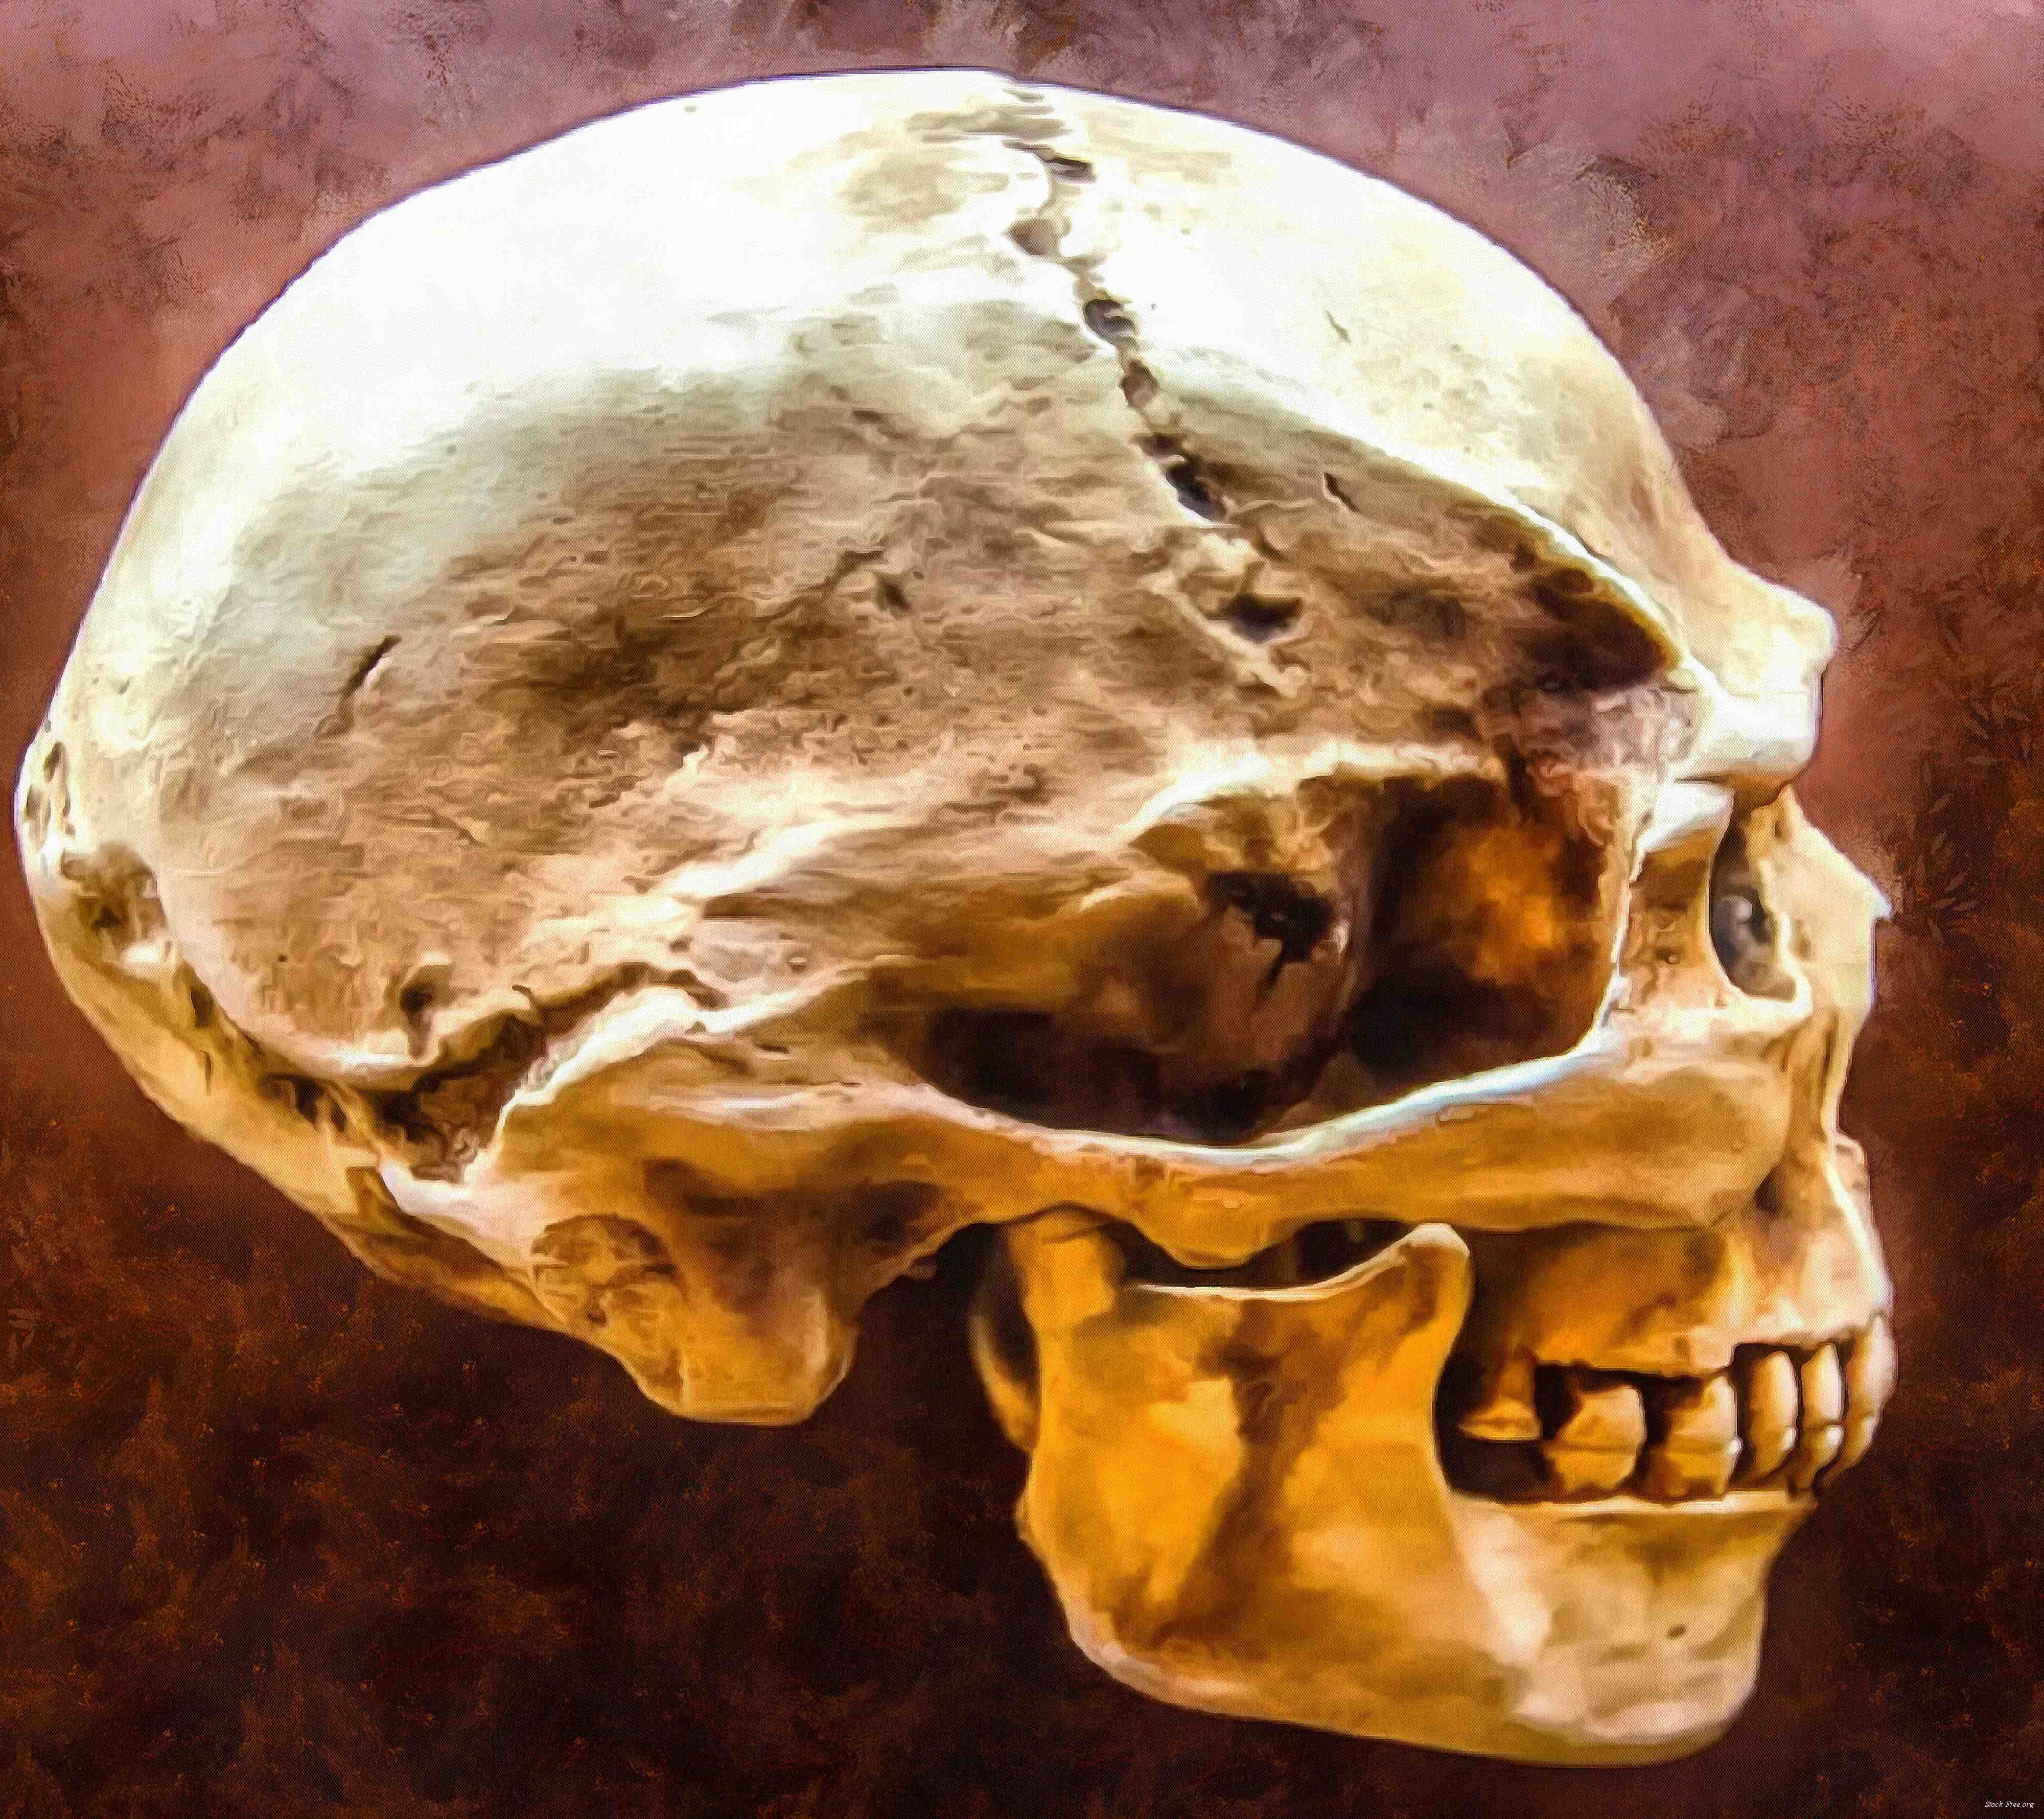 skull, head, bones, horror, halloween - halloween free image, free images, public domain images, stock free images, download image for free, halloween stock free images!